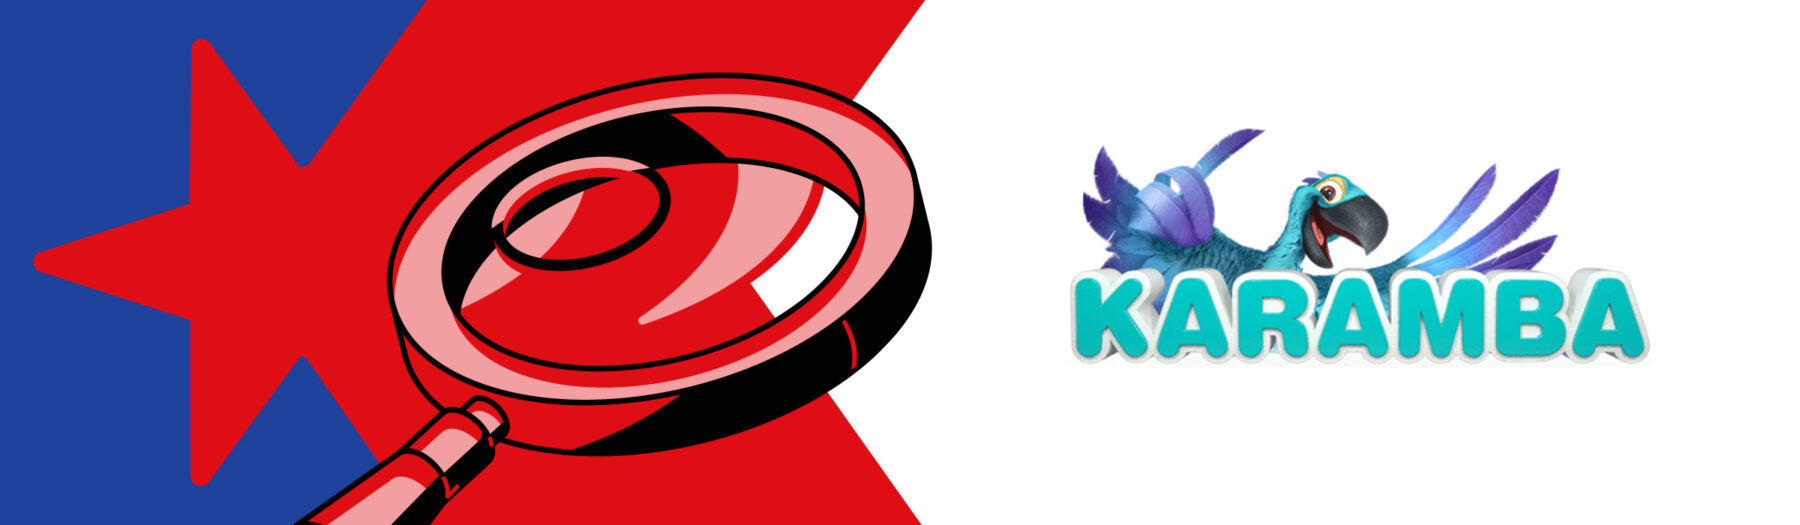 Experiencia con Karamba Casino